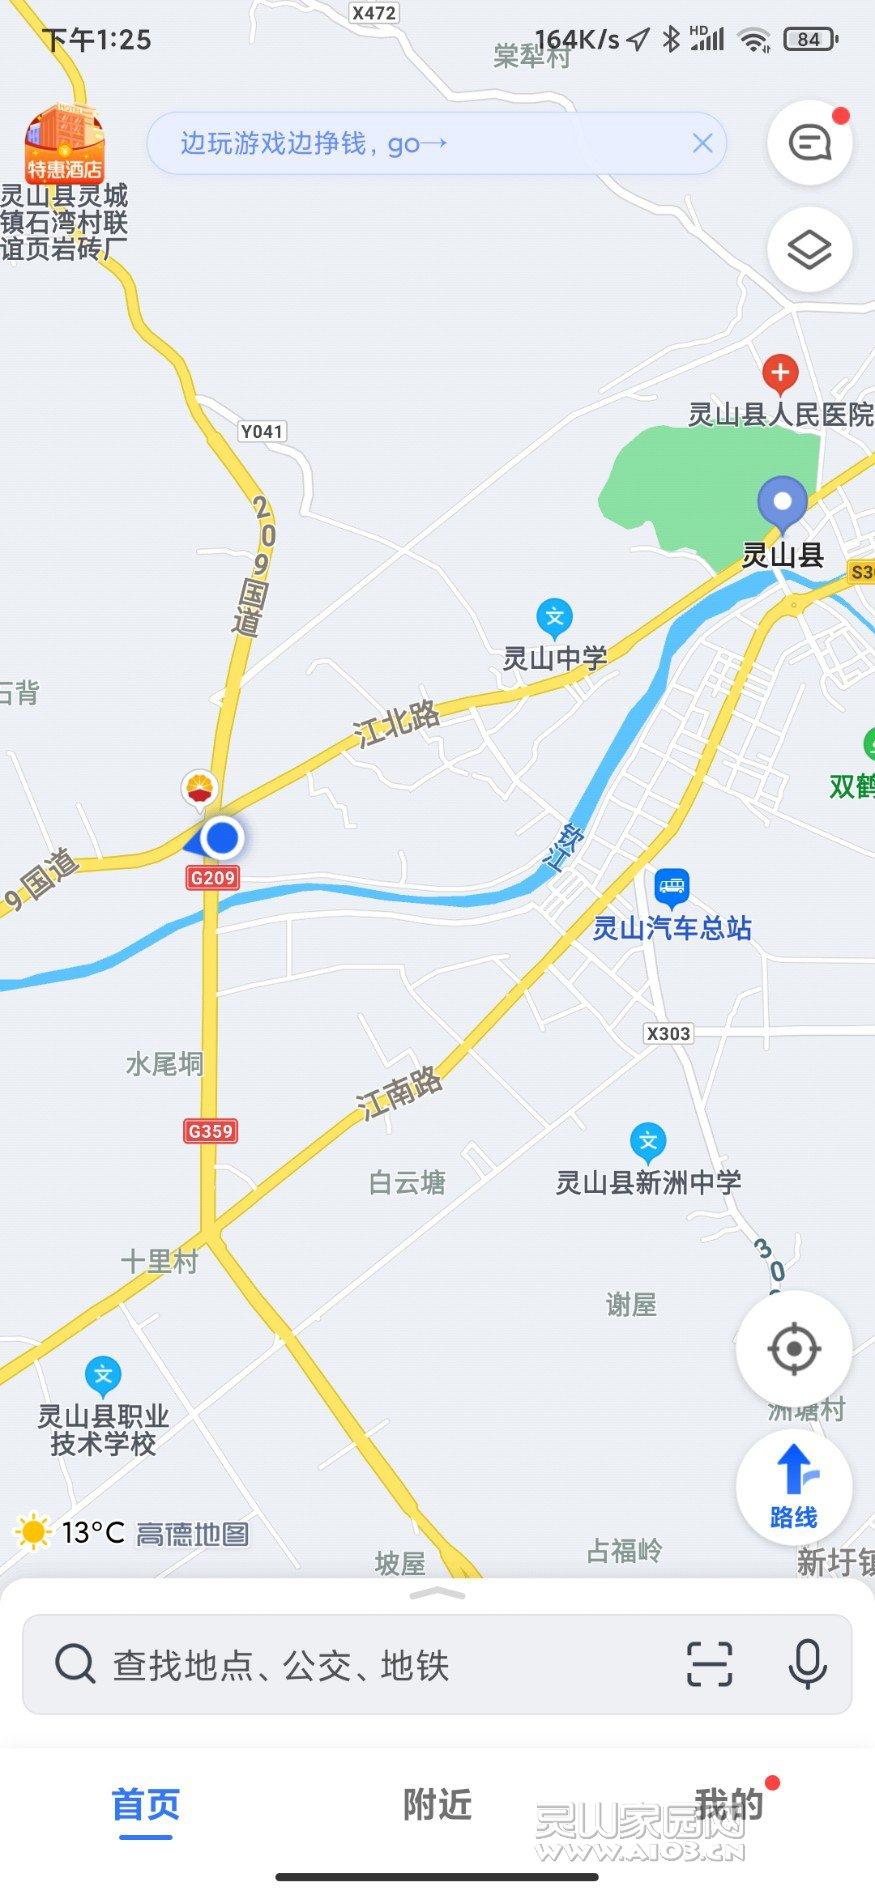 Screenshot_2021-01-12-13-25-25-538_com.autonavi.m_gaitubao_875x1895.jpg